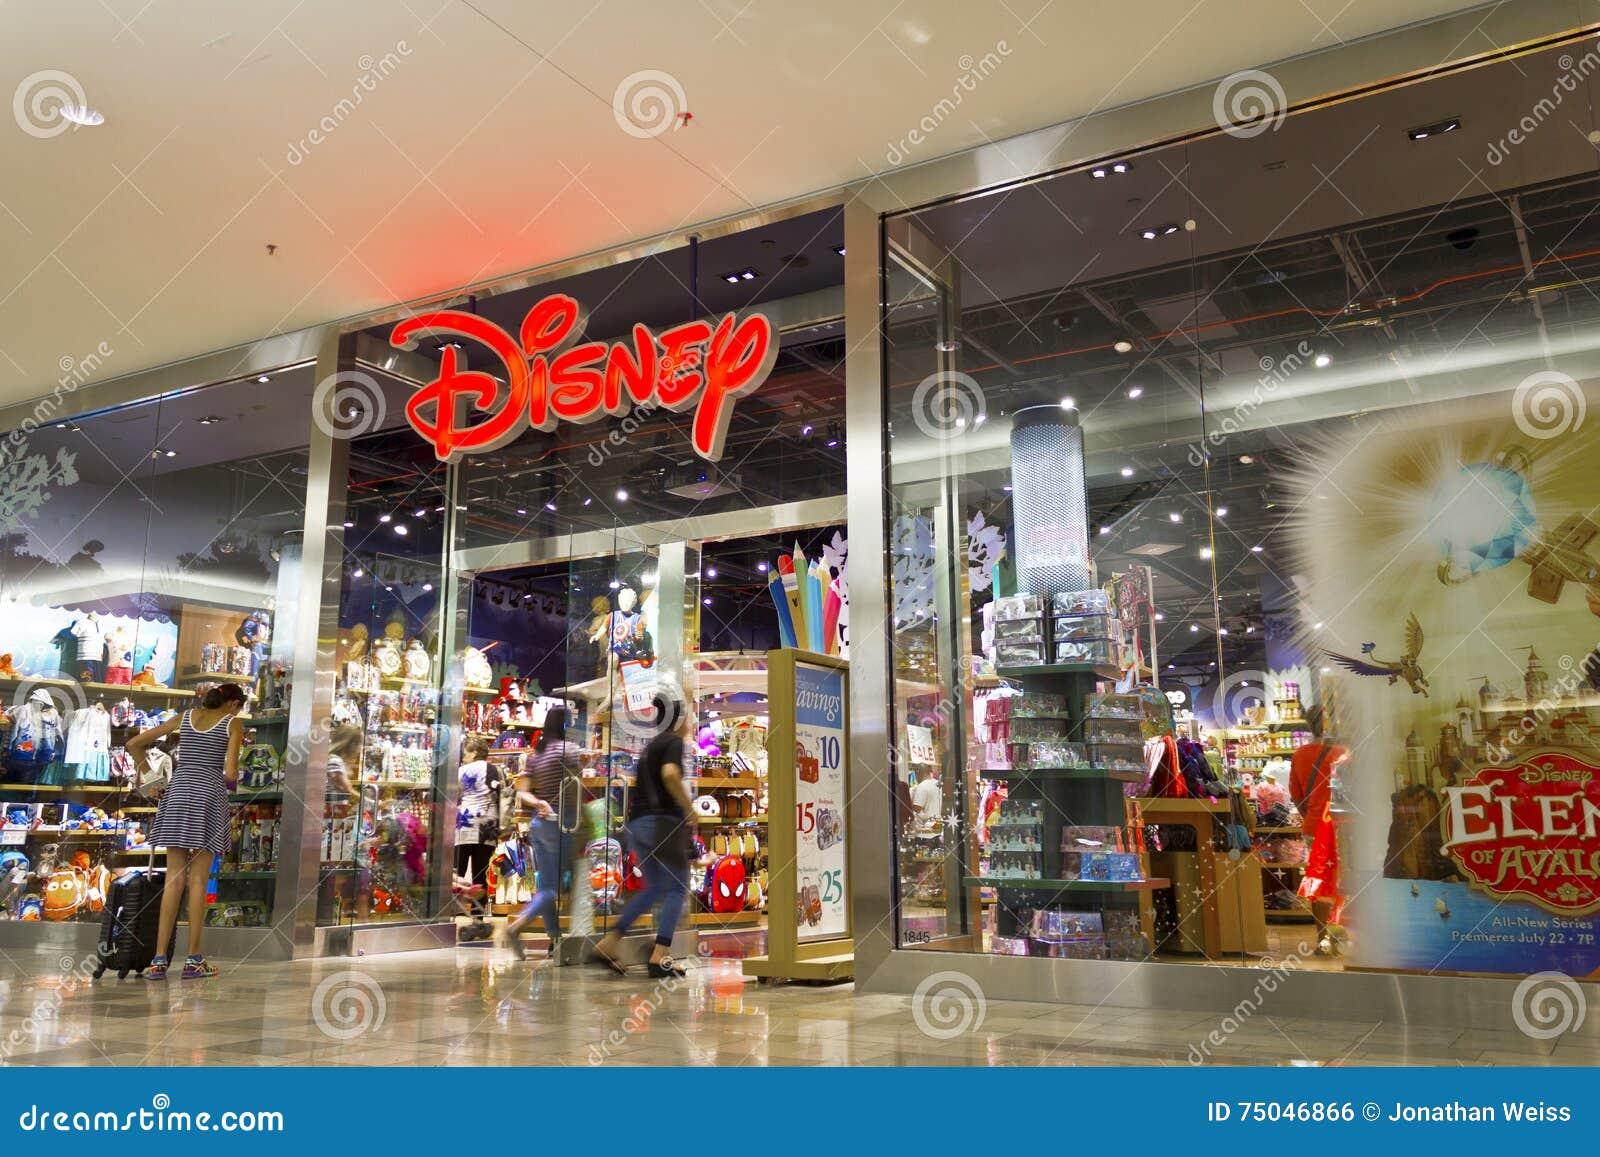 Disneyland Resort - SHARE